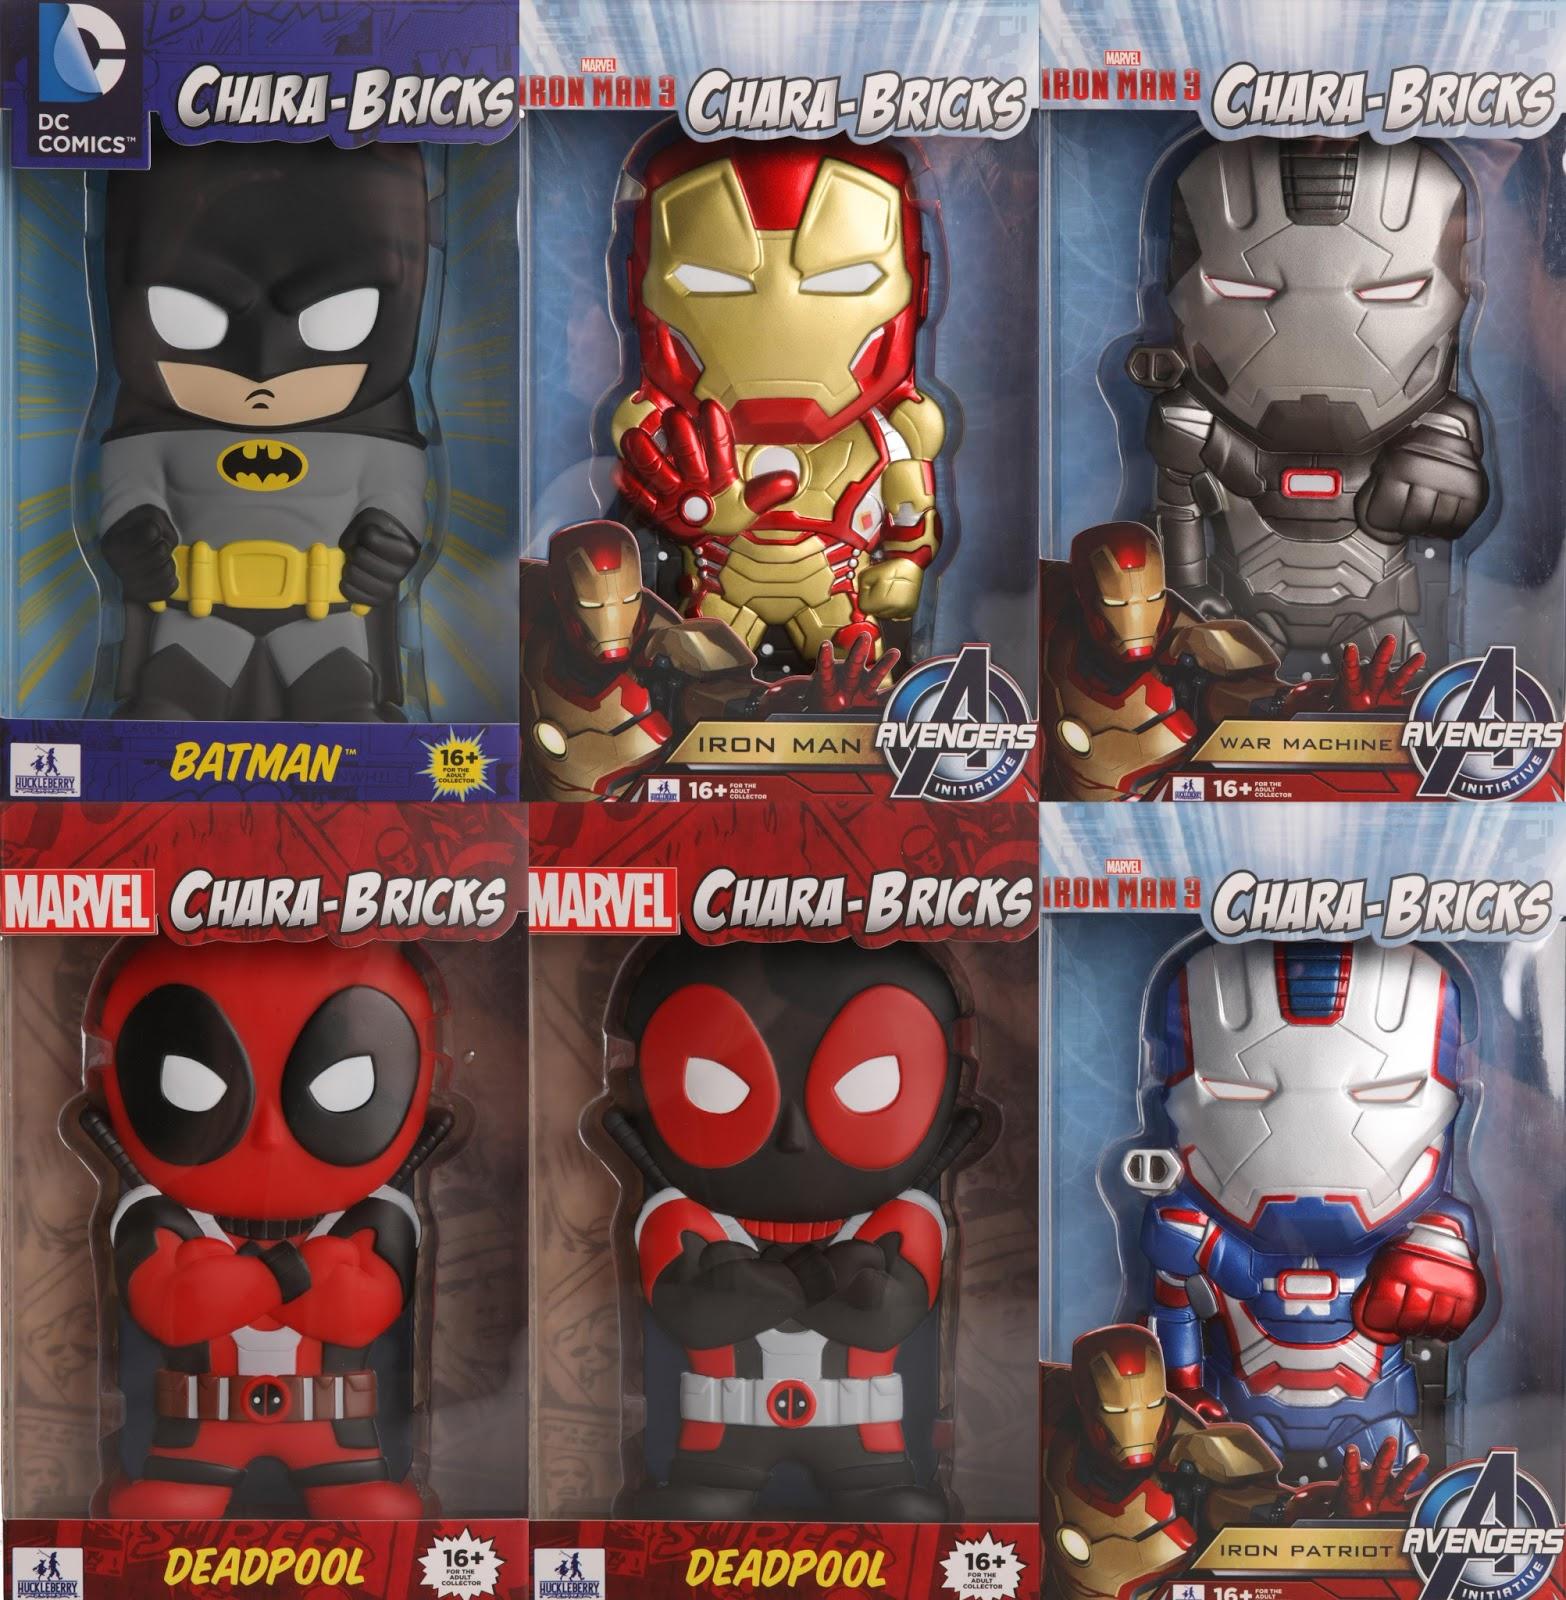 new product 03441 d5f35 The Blot Says...: SDCC 13 Exclusive DC & Marvel Chara-Brick Vinyl ...